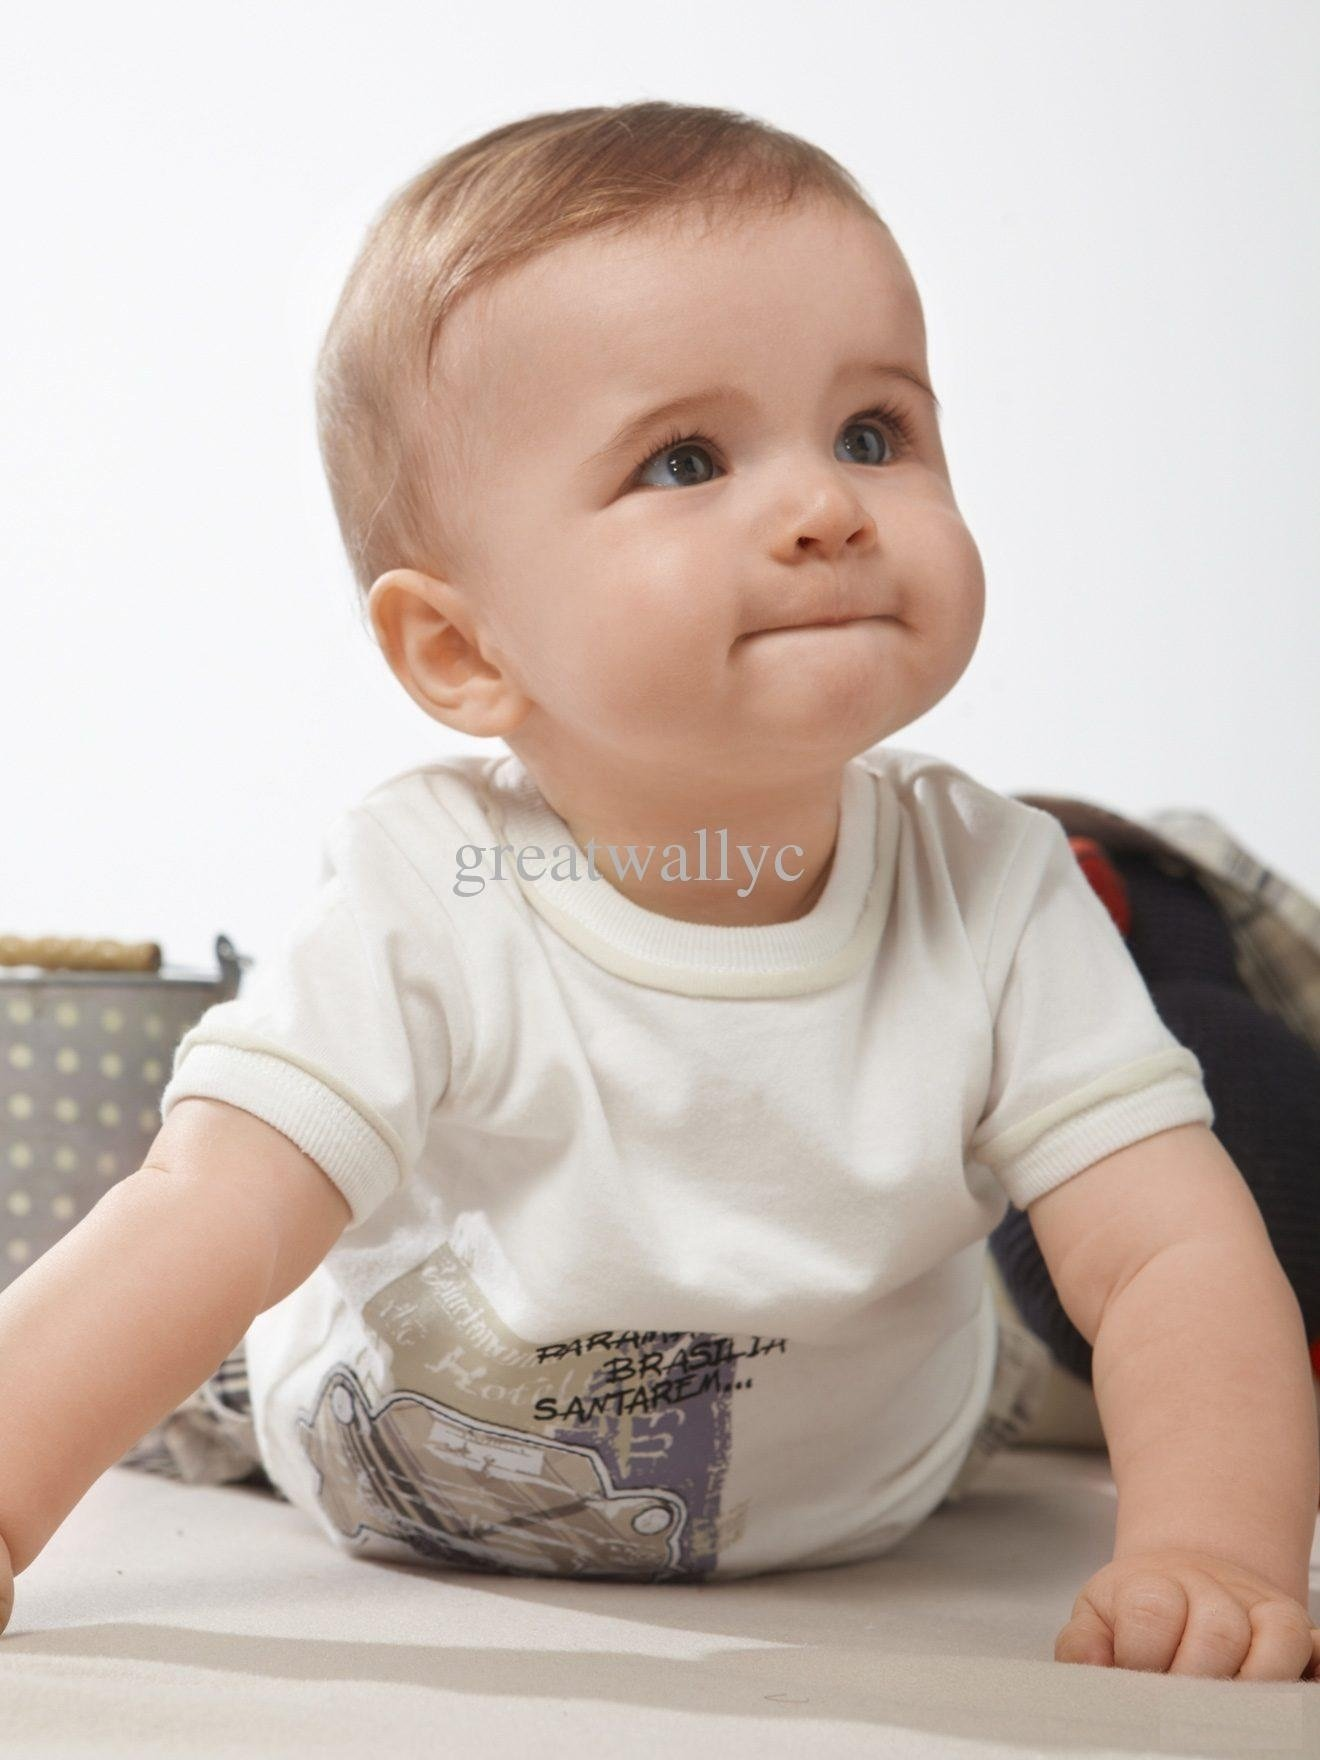 10 Cute Cute Baby Boy Picture Ideas cute baby boy clothes boutique ideas 18 nationtrendz 2020